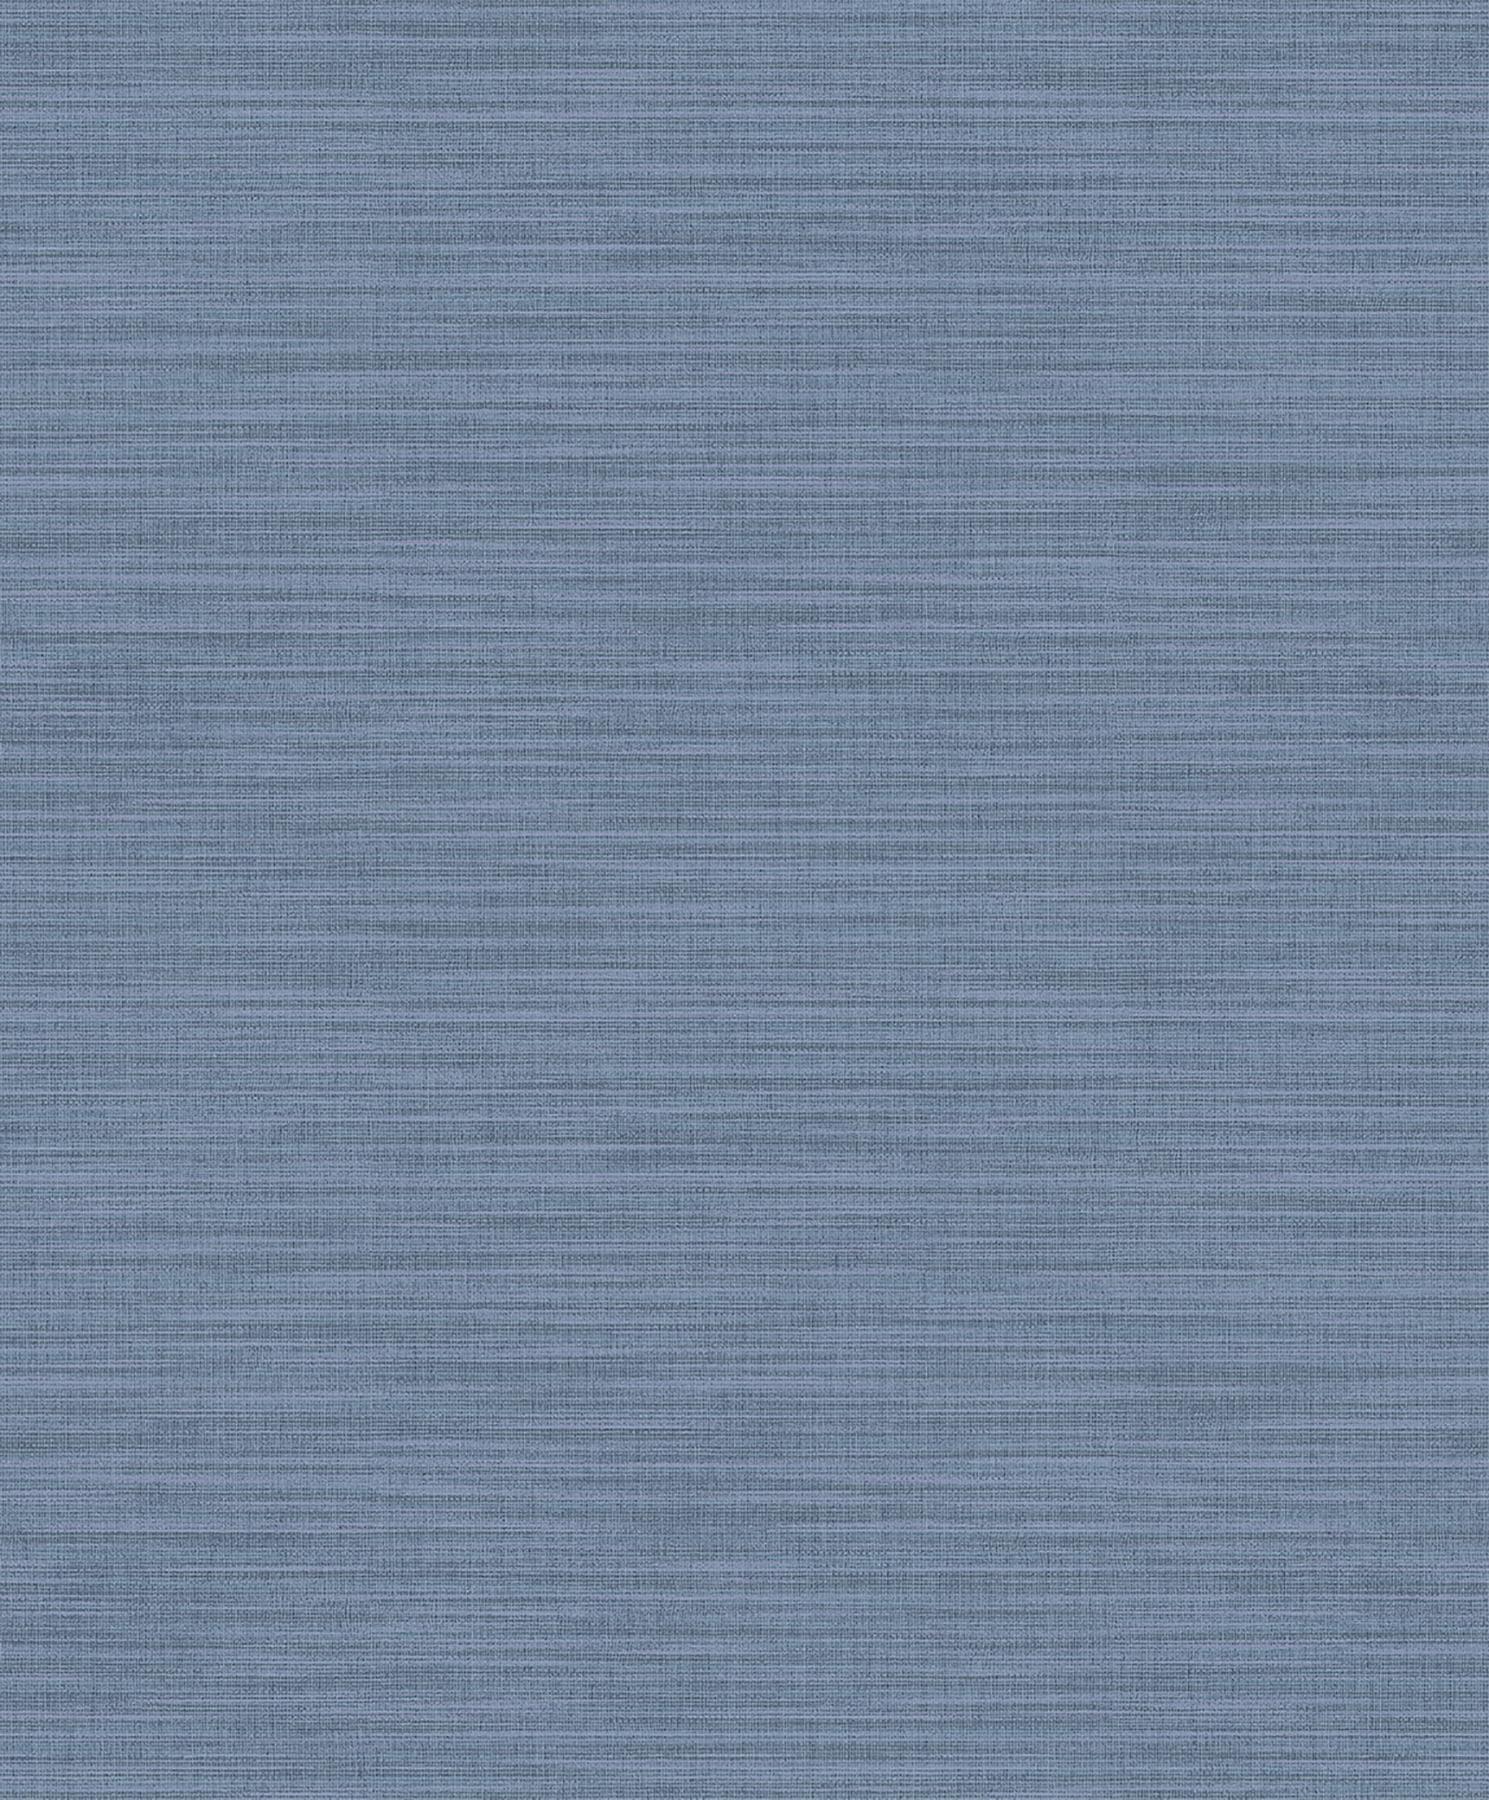 Picture of Ashleigh Blue Linen Texture Wallpaper